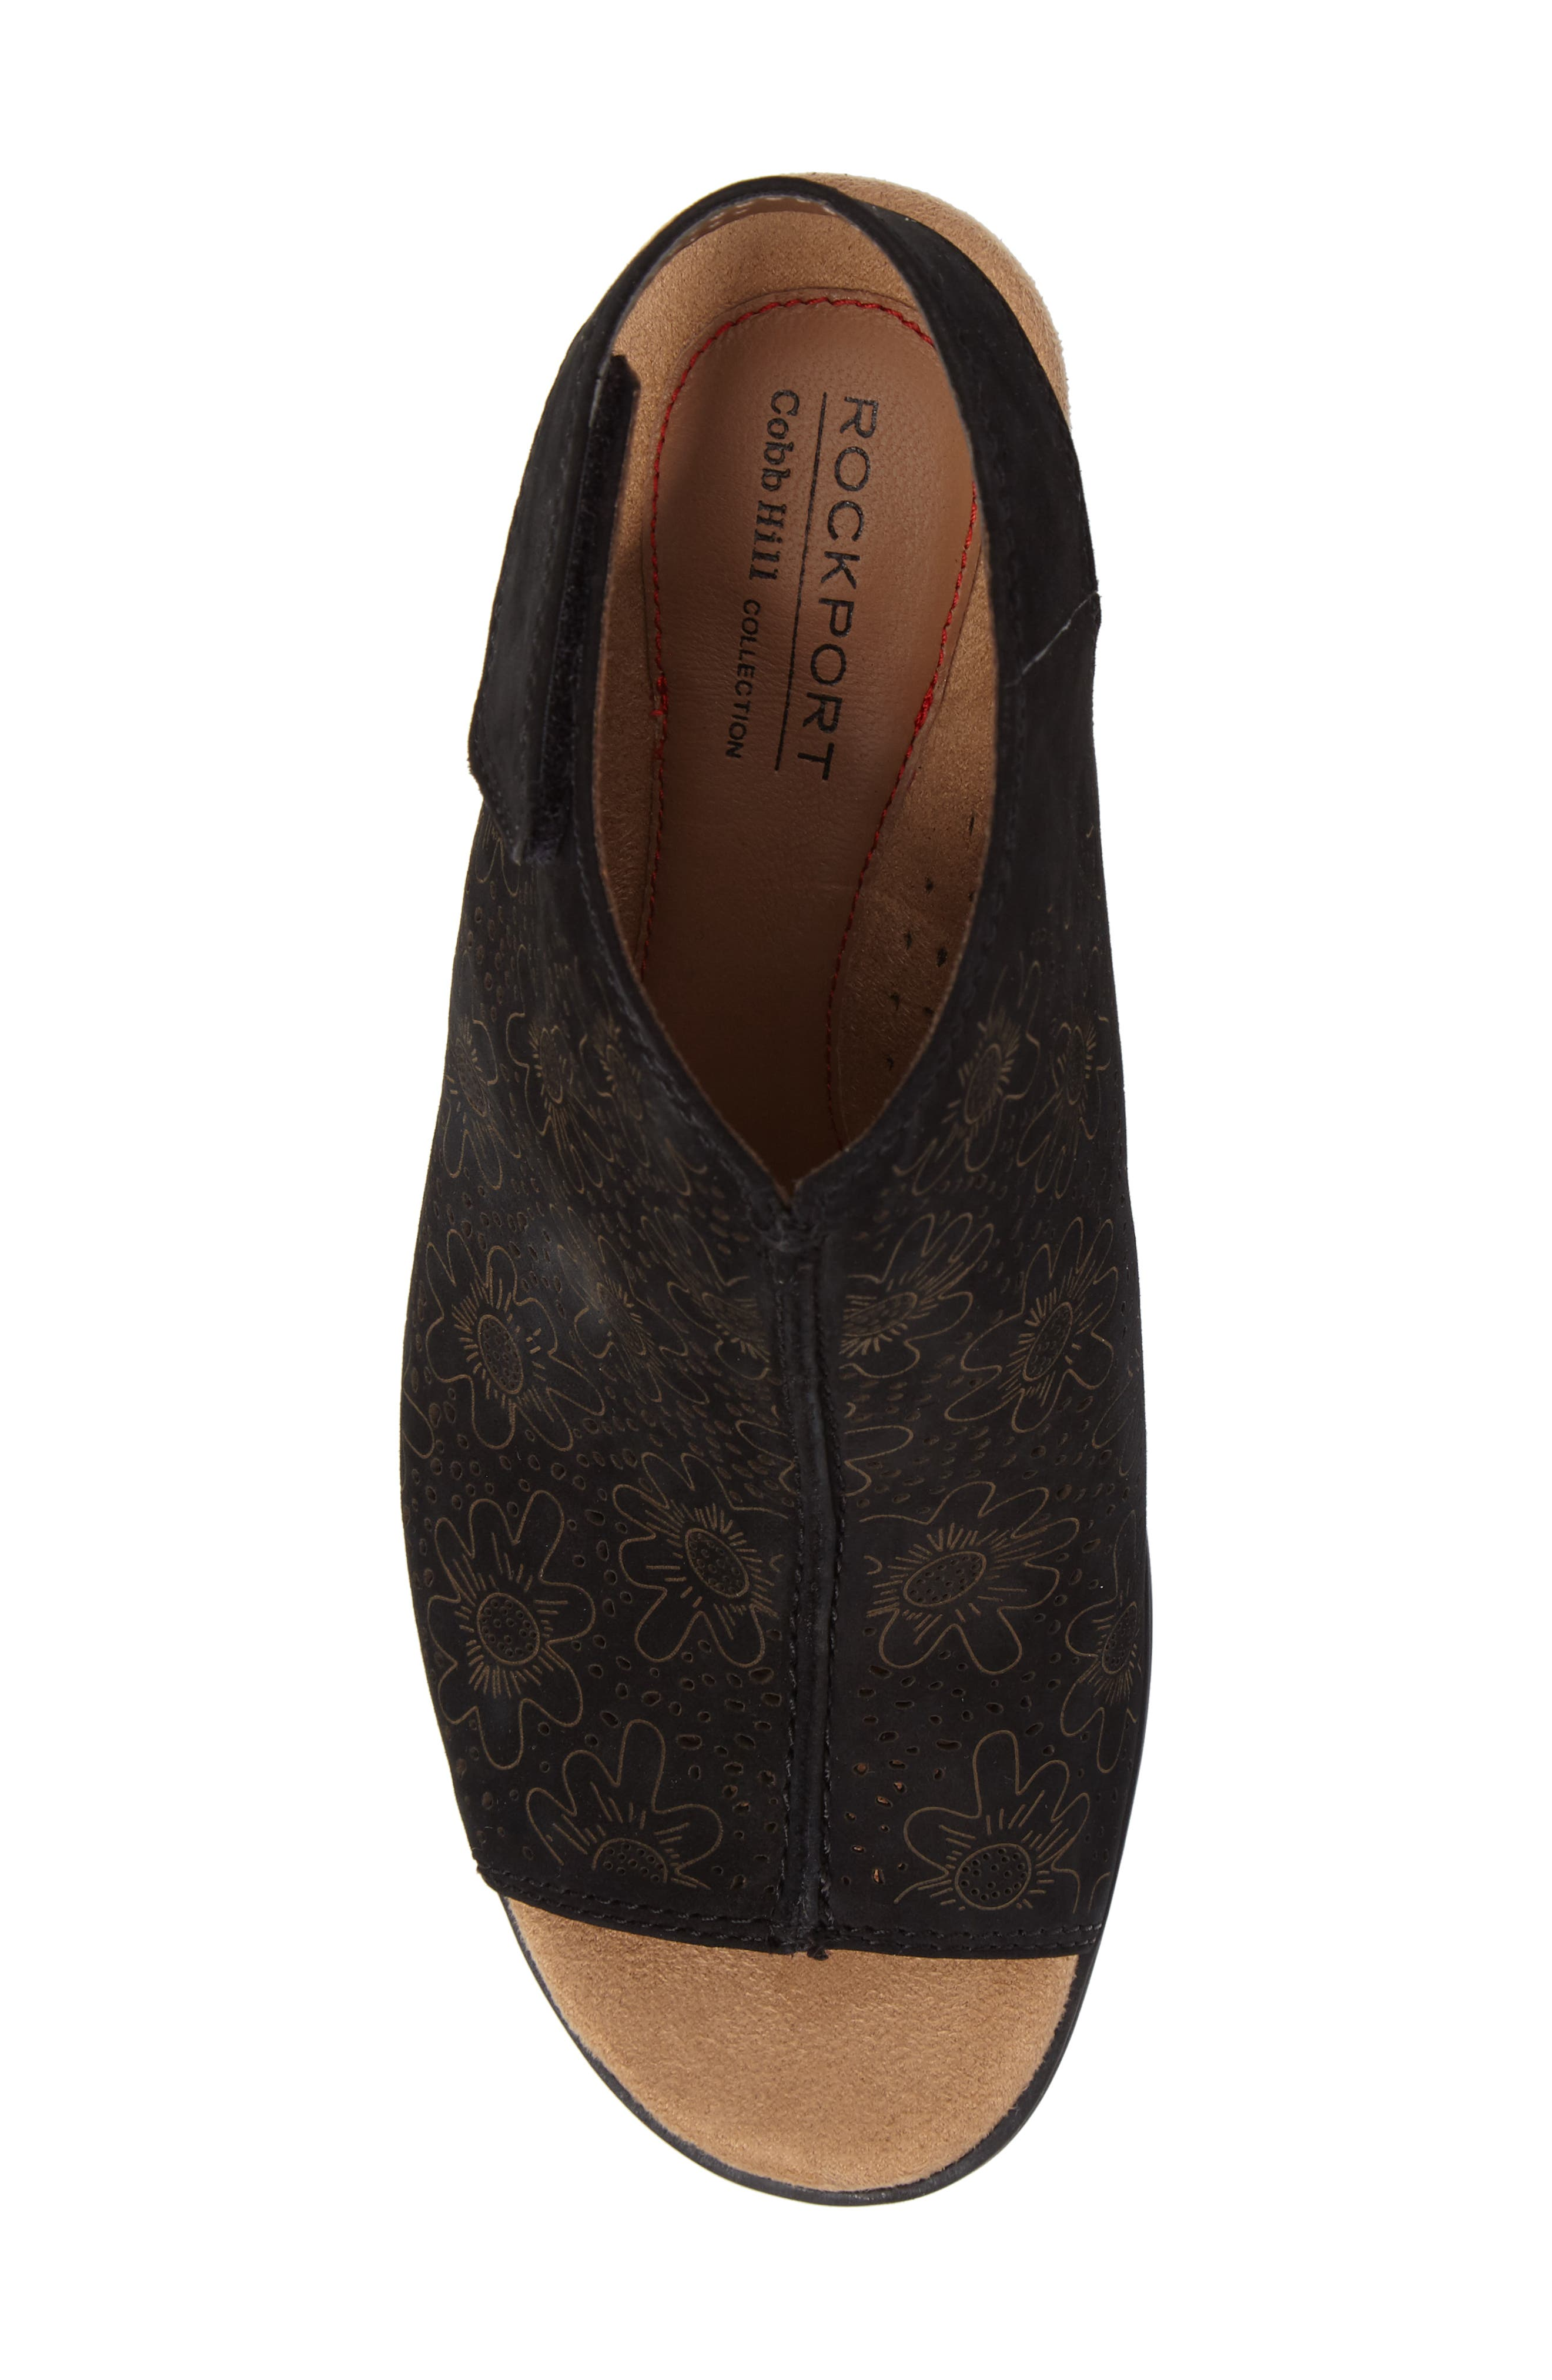 ROCKPORT COBB HILL,                             Hattie Perforated Slingback Sandal,                             Alternate thumbnail 5, color,                             BLACK NUBUCK